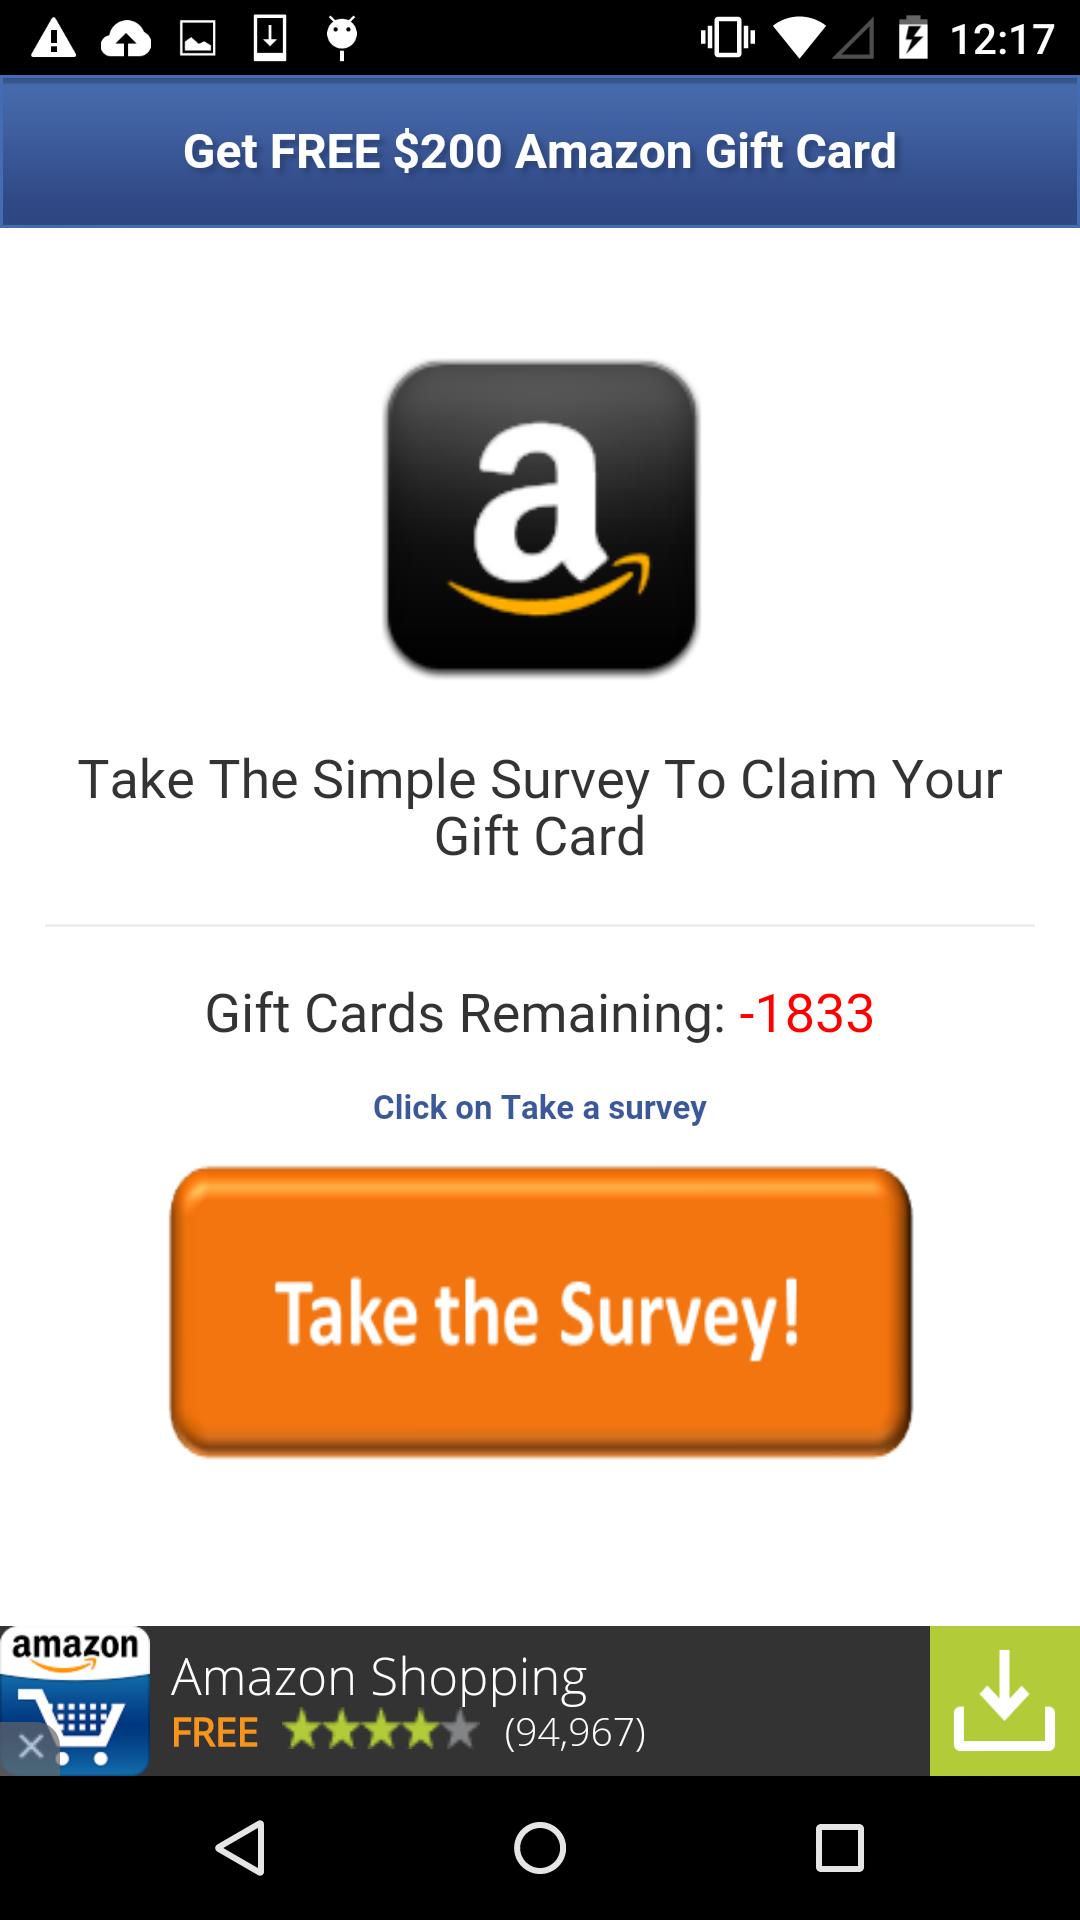 Worm.Gazon: Want Gift Card? Get Malware | AdaptiveMobile